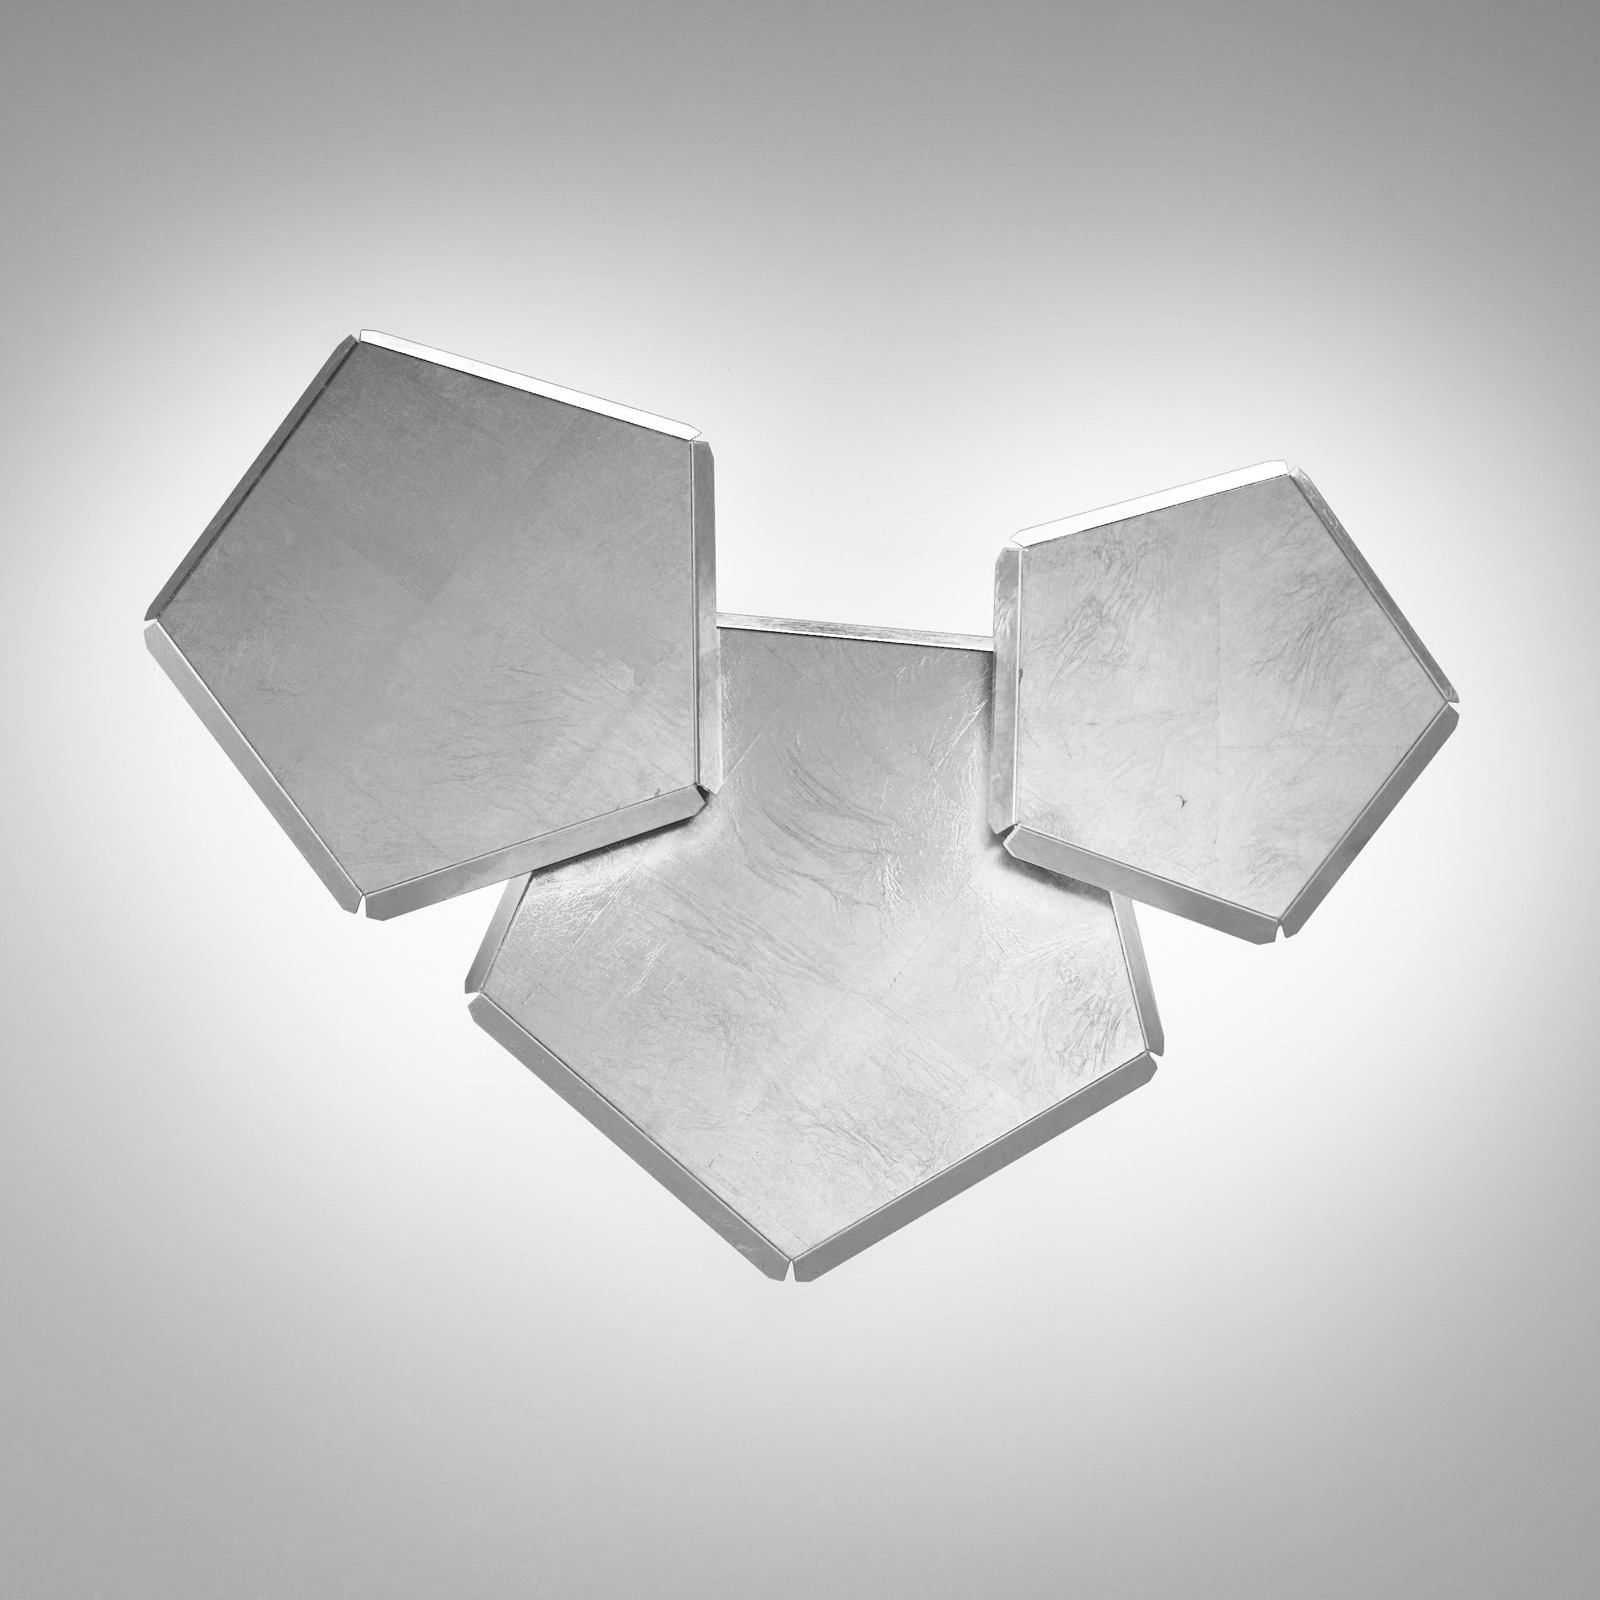 LED-vegglampe Pleiadi med sølvblad 3 lyskilder